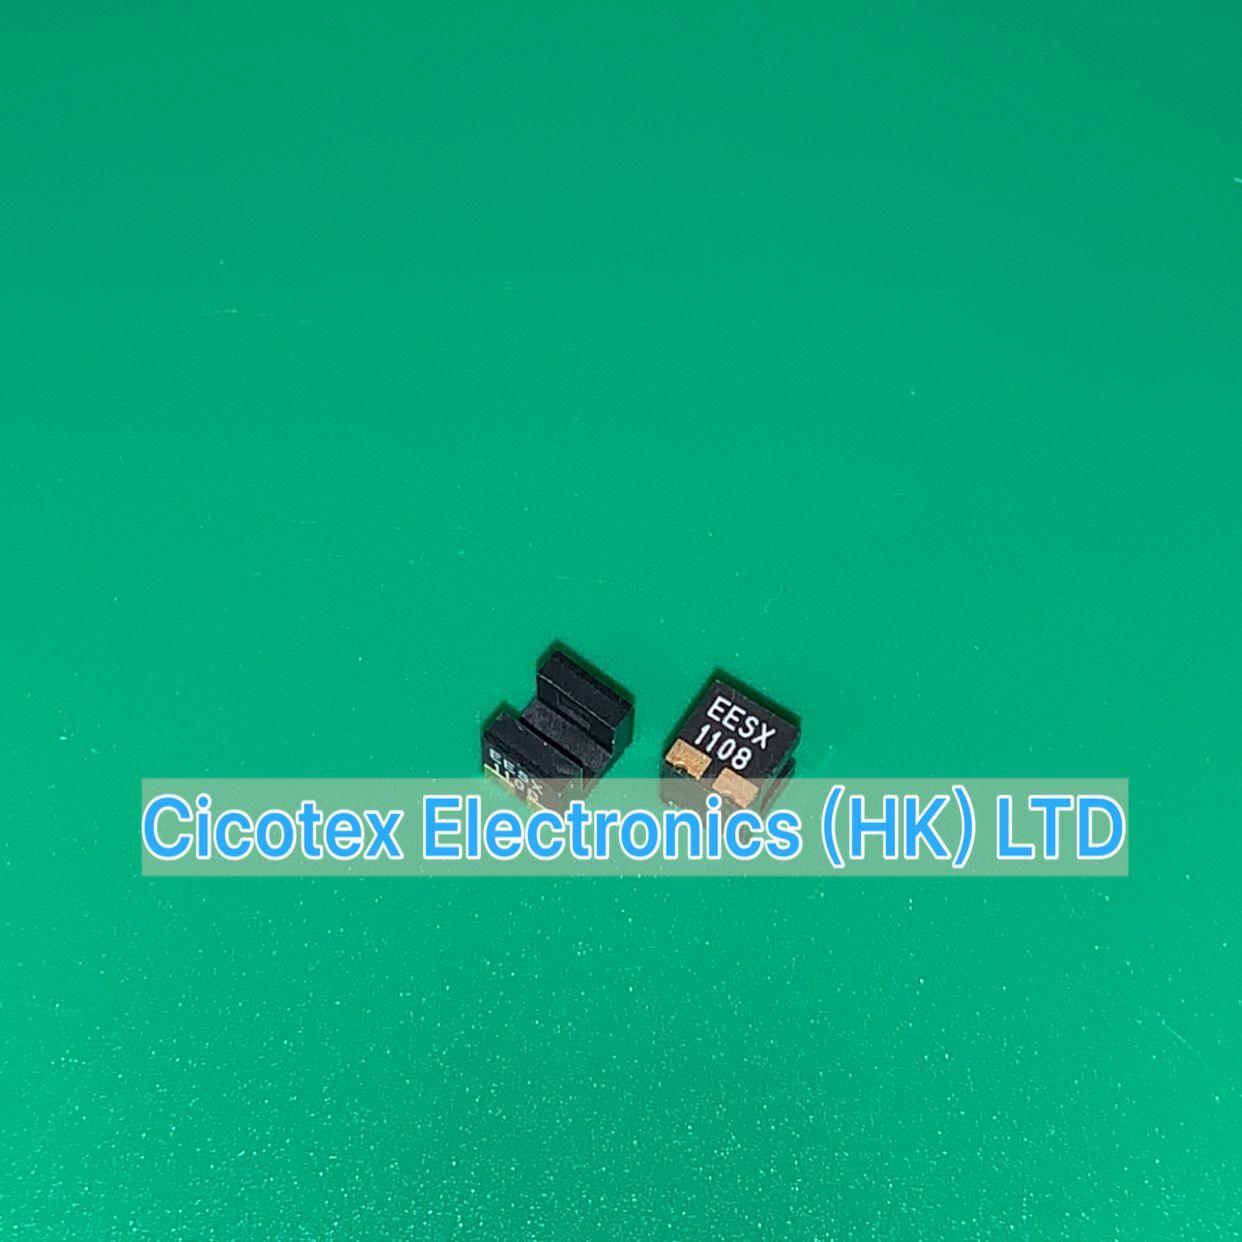 5pcs/lot EE-SX1108 SMD4 EE-SX 1108 SENSOR OPT SLOT PHOTOTRANS 4SMD EESX1108 EESX-1108